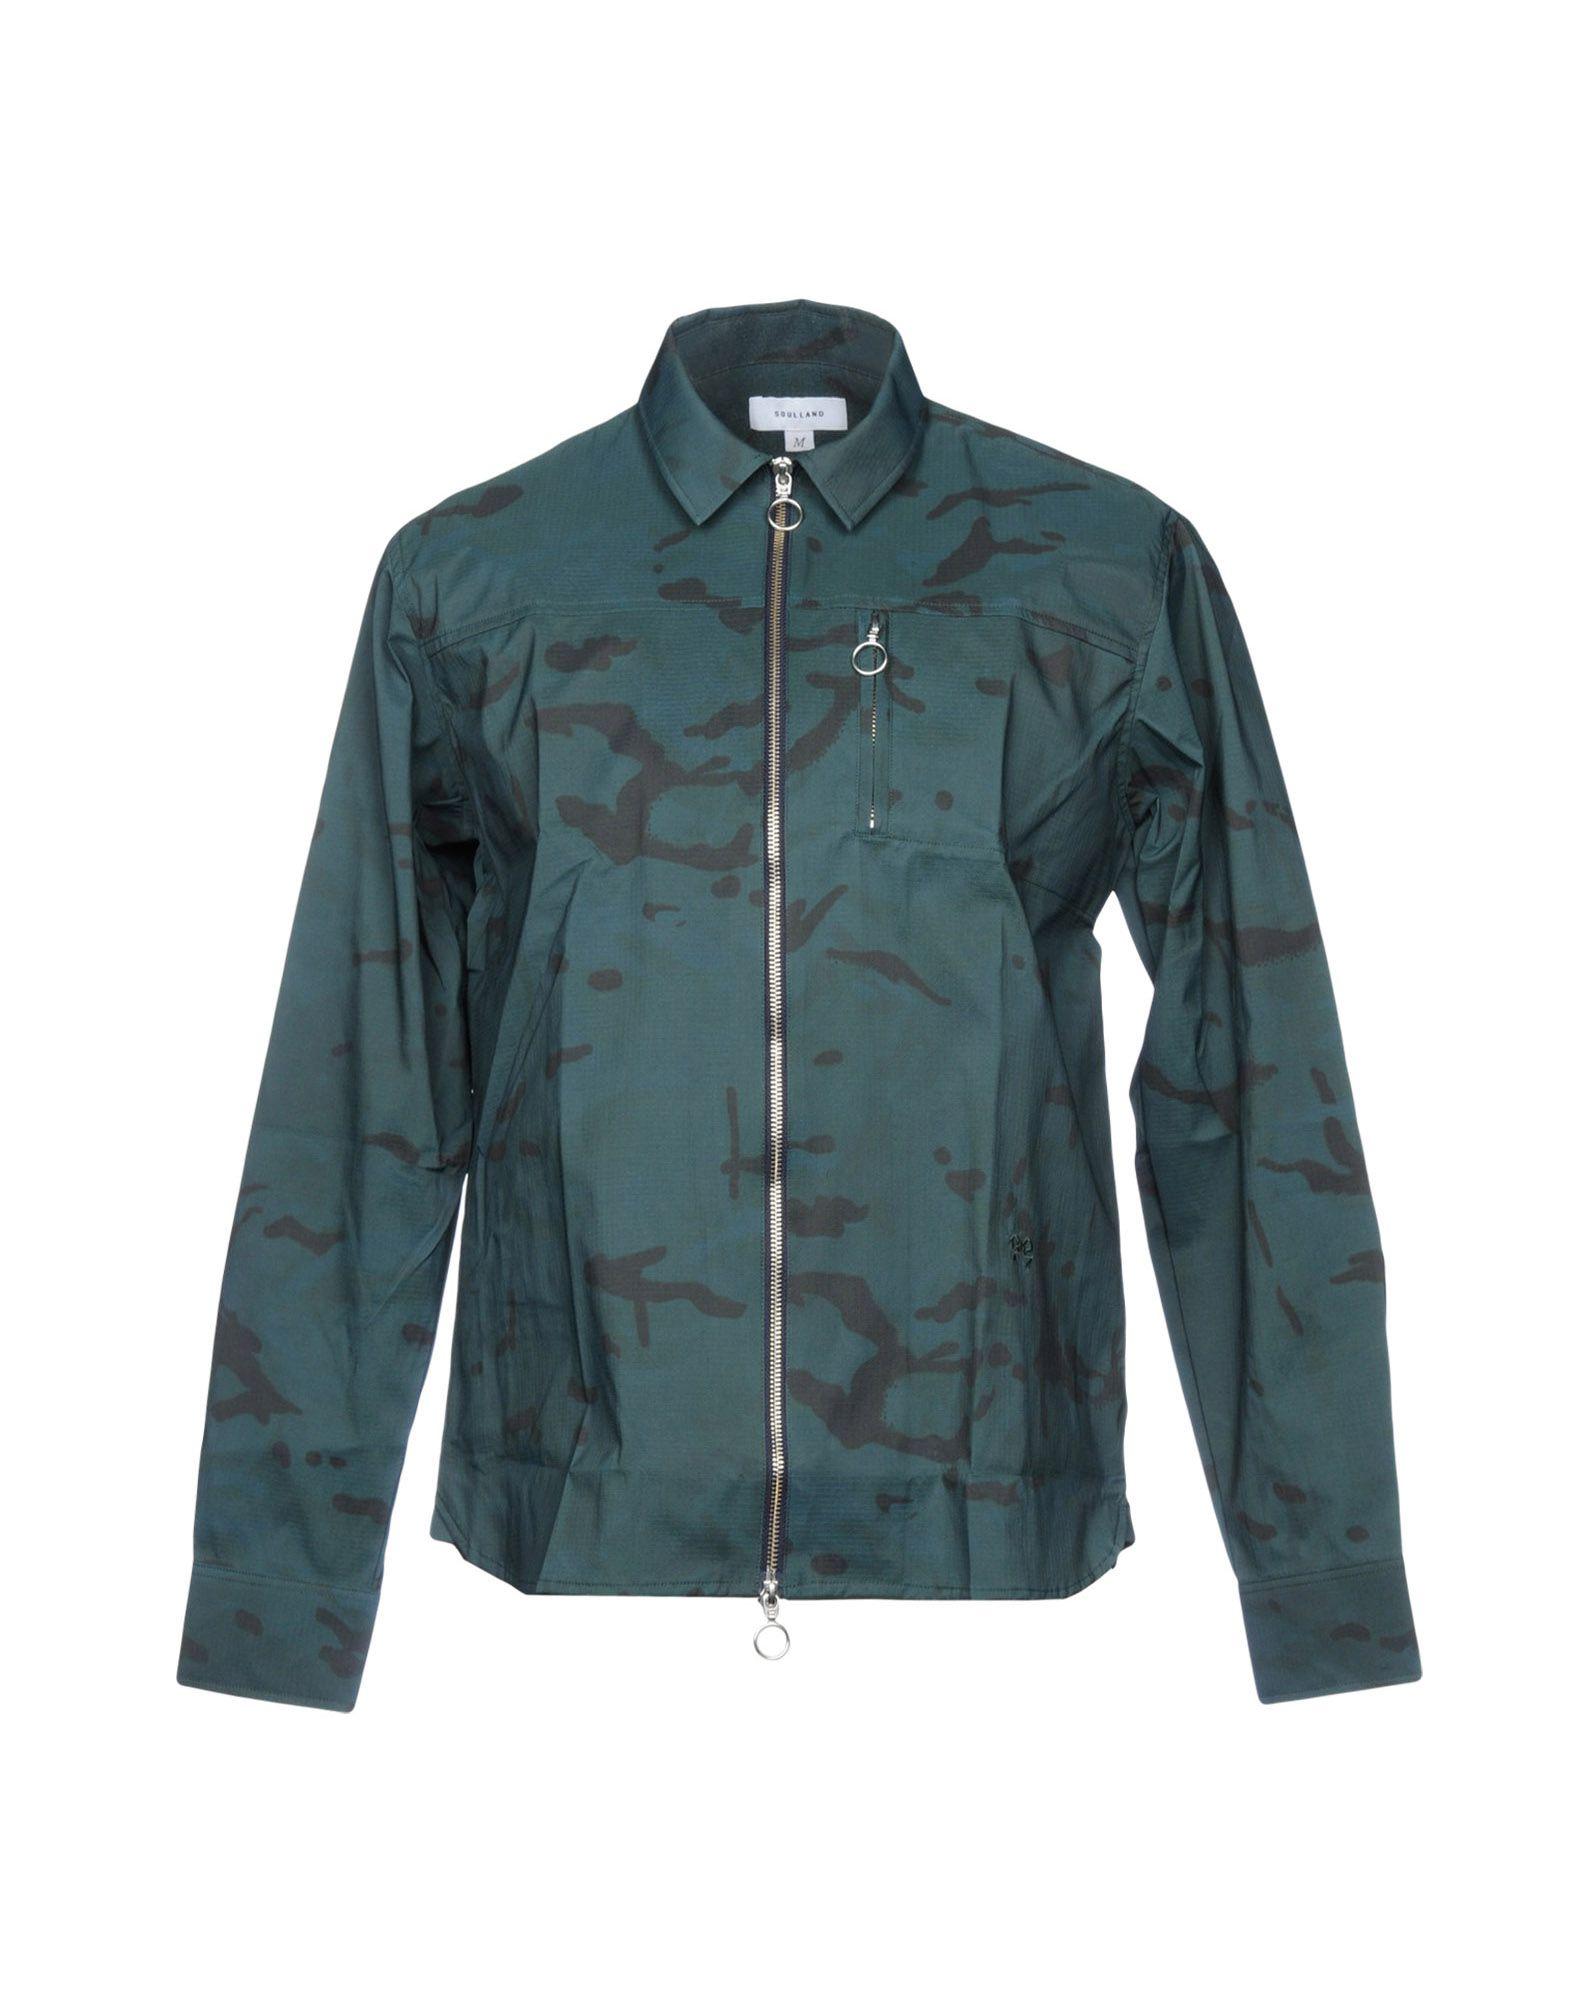 SOULLAND Jacket in Dark Green